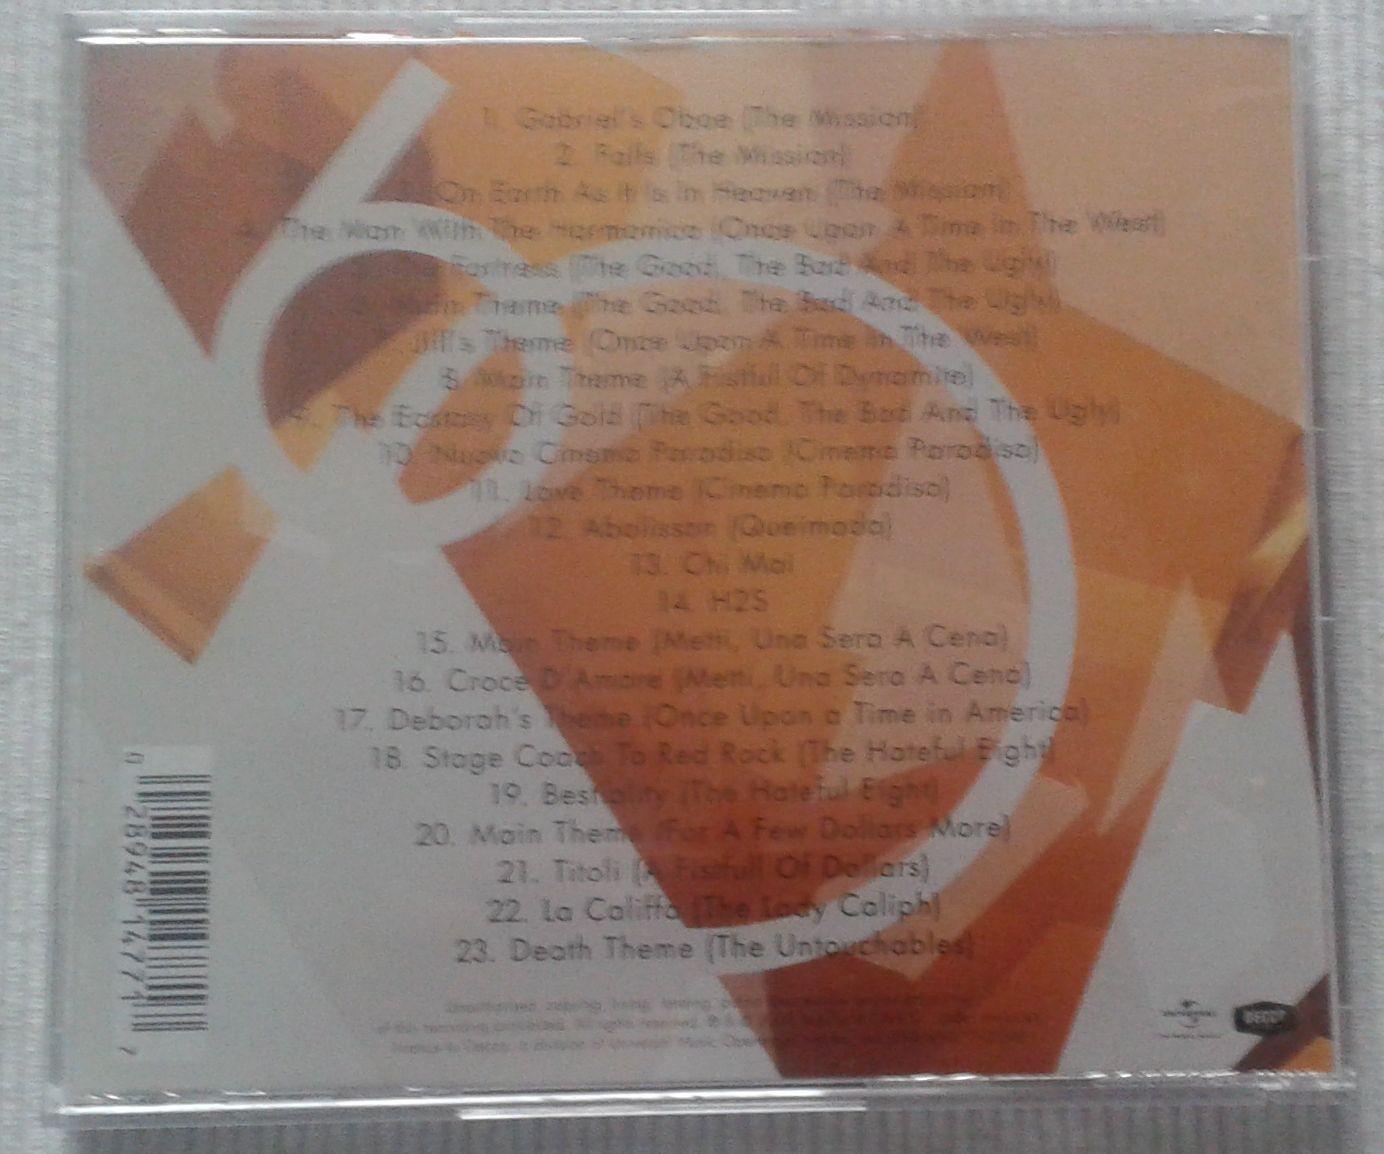 Ennio 60 CD tył.jpg